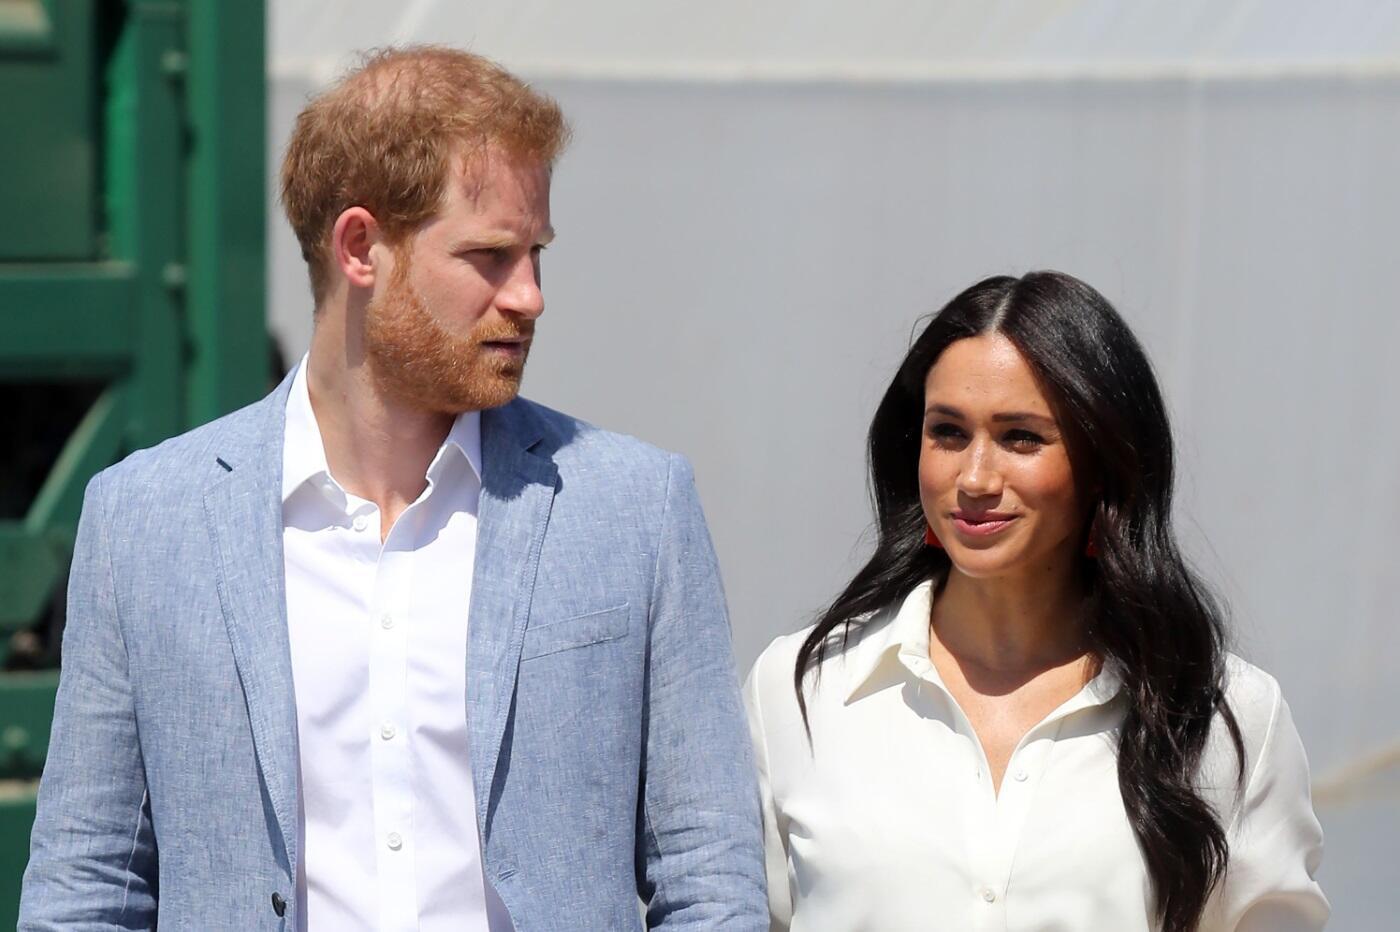 Prince Harry, Meghan Markle step back as senior royals - World News